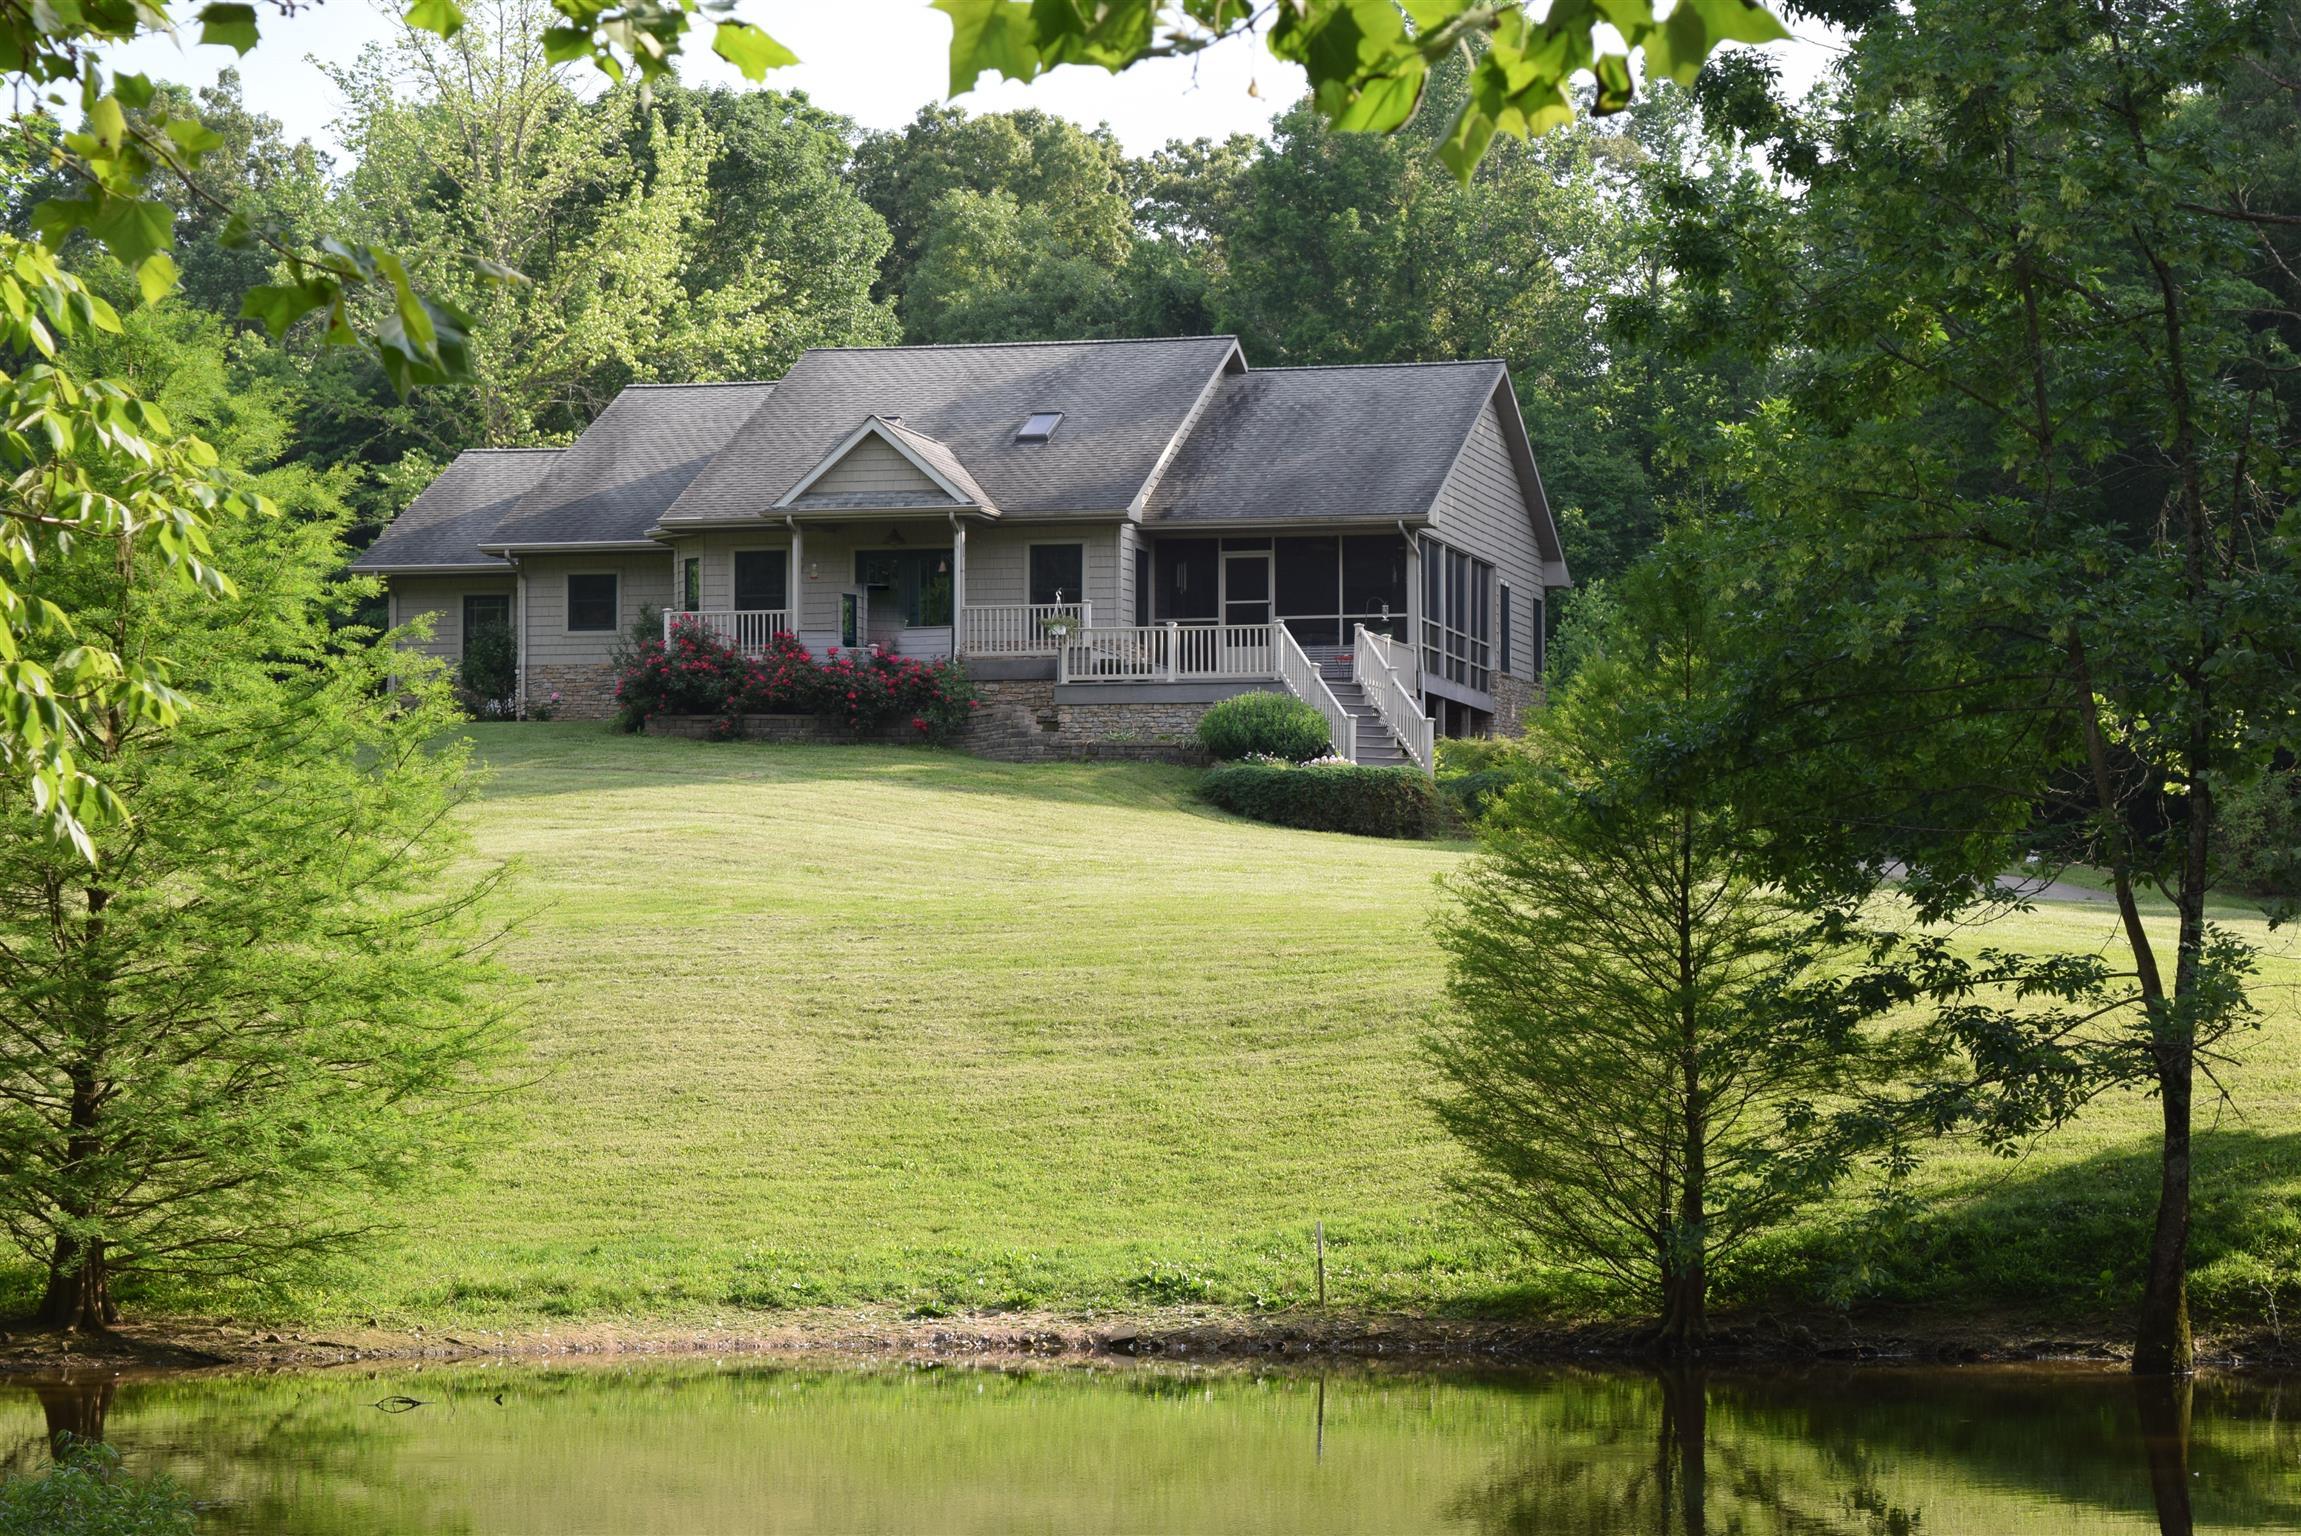 264 Muddy Fork Ln, Cadiz, KY 42211 - Cadiz, KY real estate listing